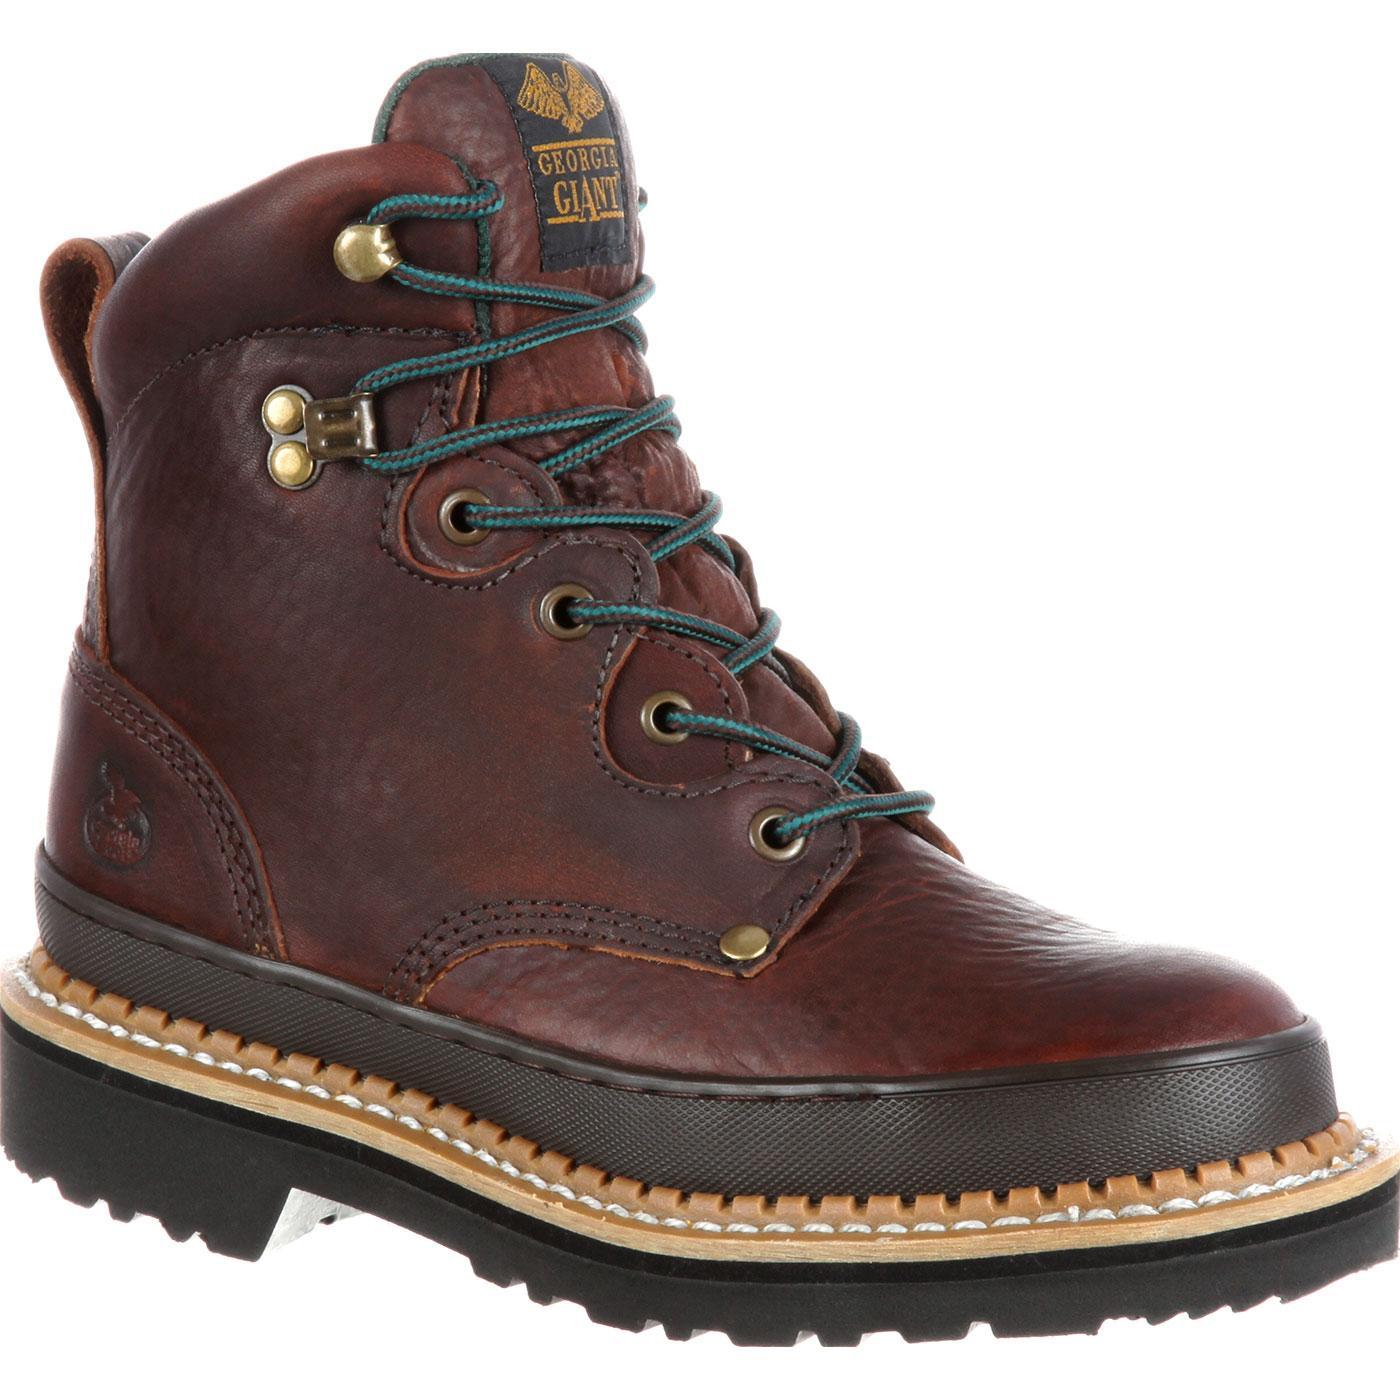 Keen Wide Boots